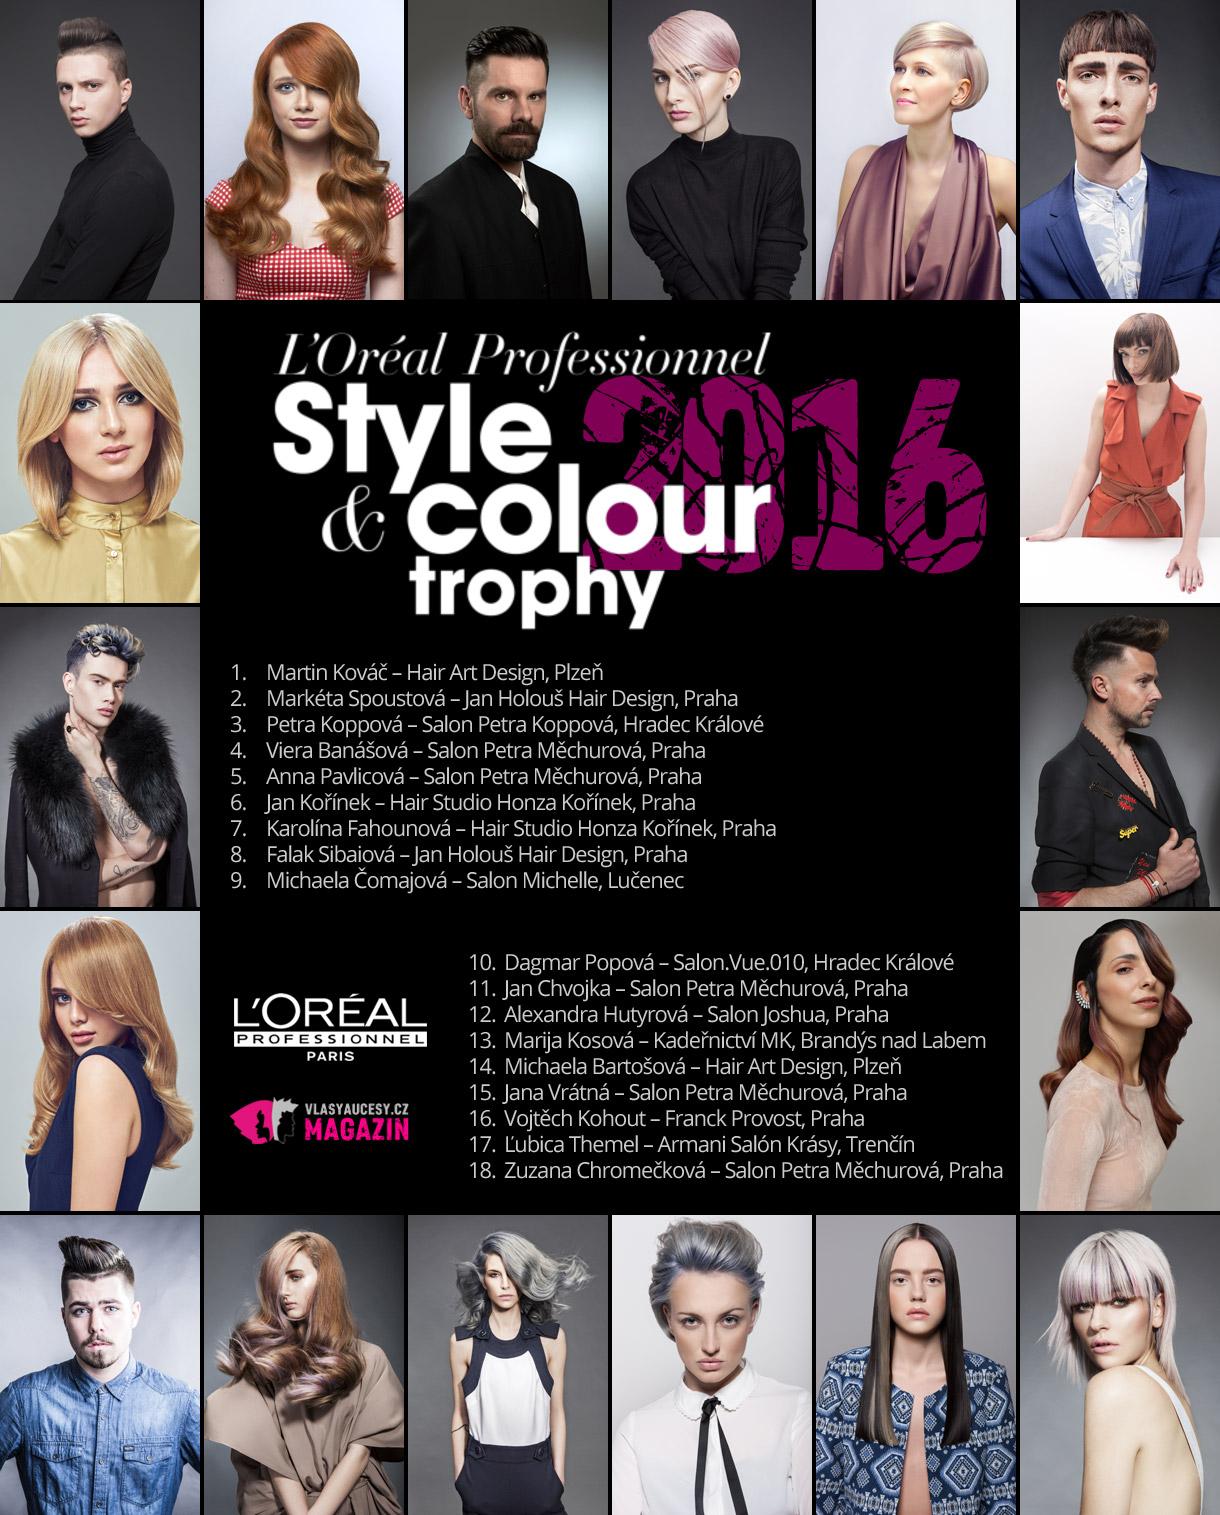 L'Oréal Style & Colour Trophy 2016 ide do finále. Víťazi budú vyhlásení 27. mája 2016 na slávnostnom galavečeri v hoteli Clarison v Prahe.